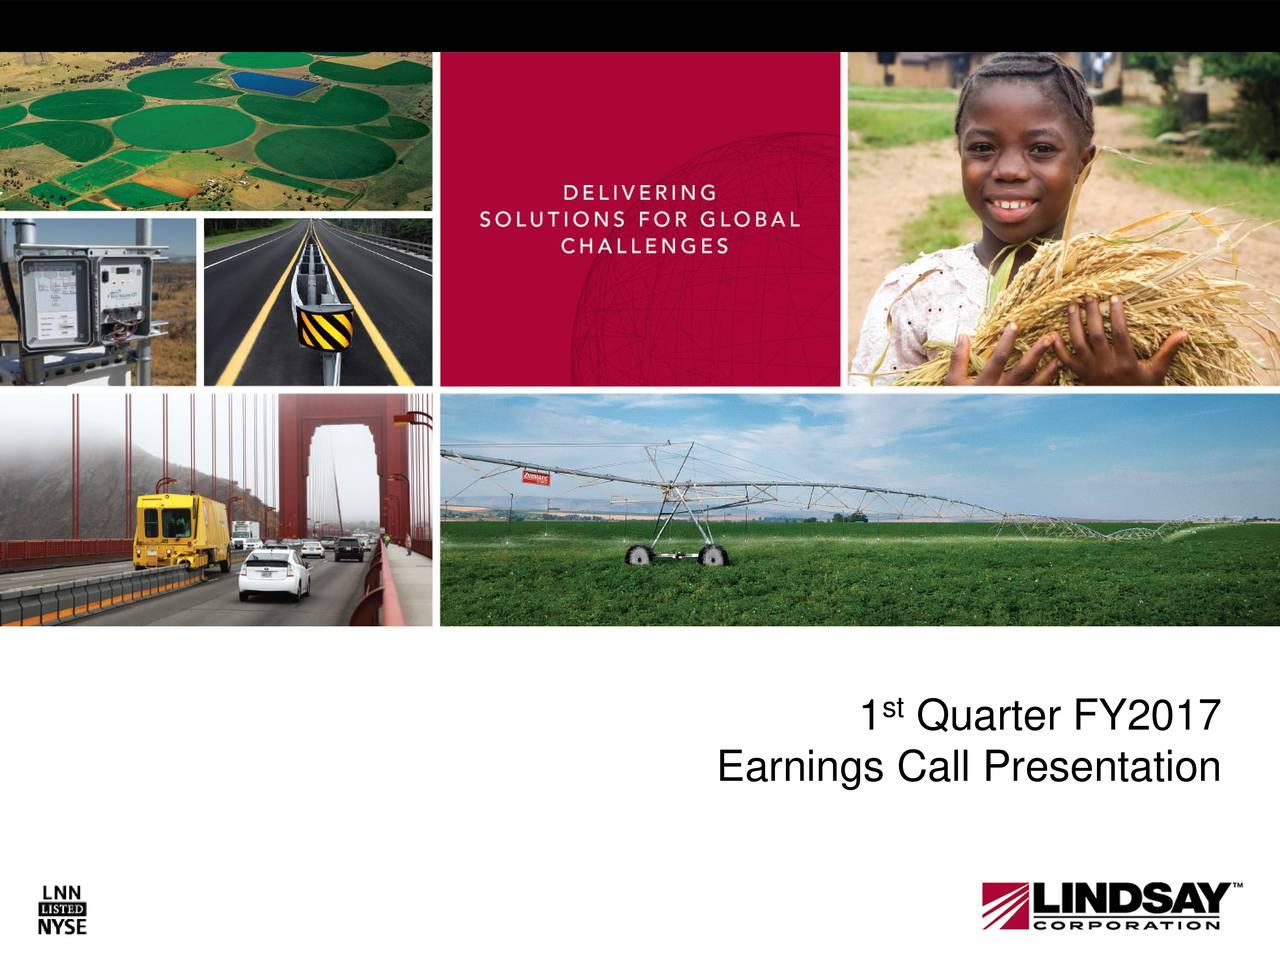 Earnings Call Presentation 1 Quarter FY2017 Earnings Call Presentati1n